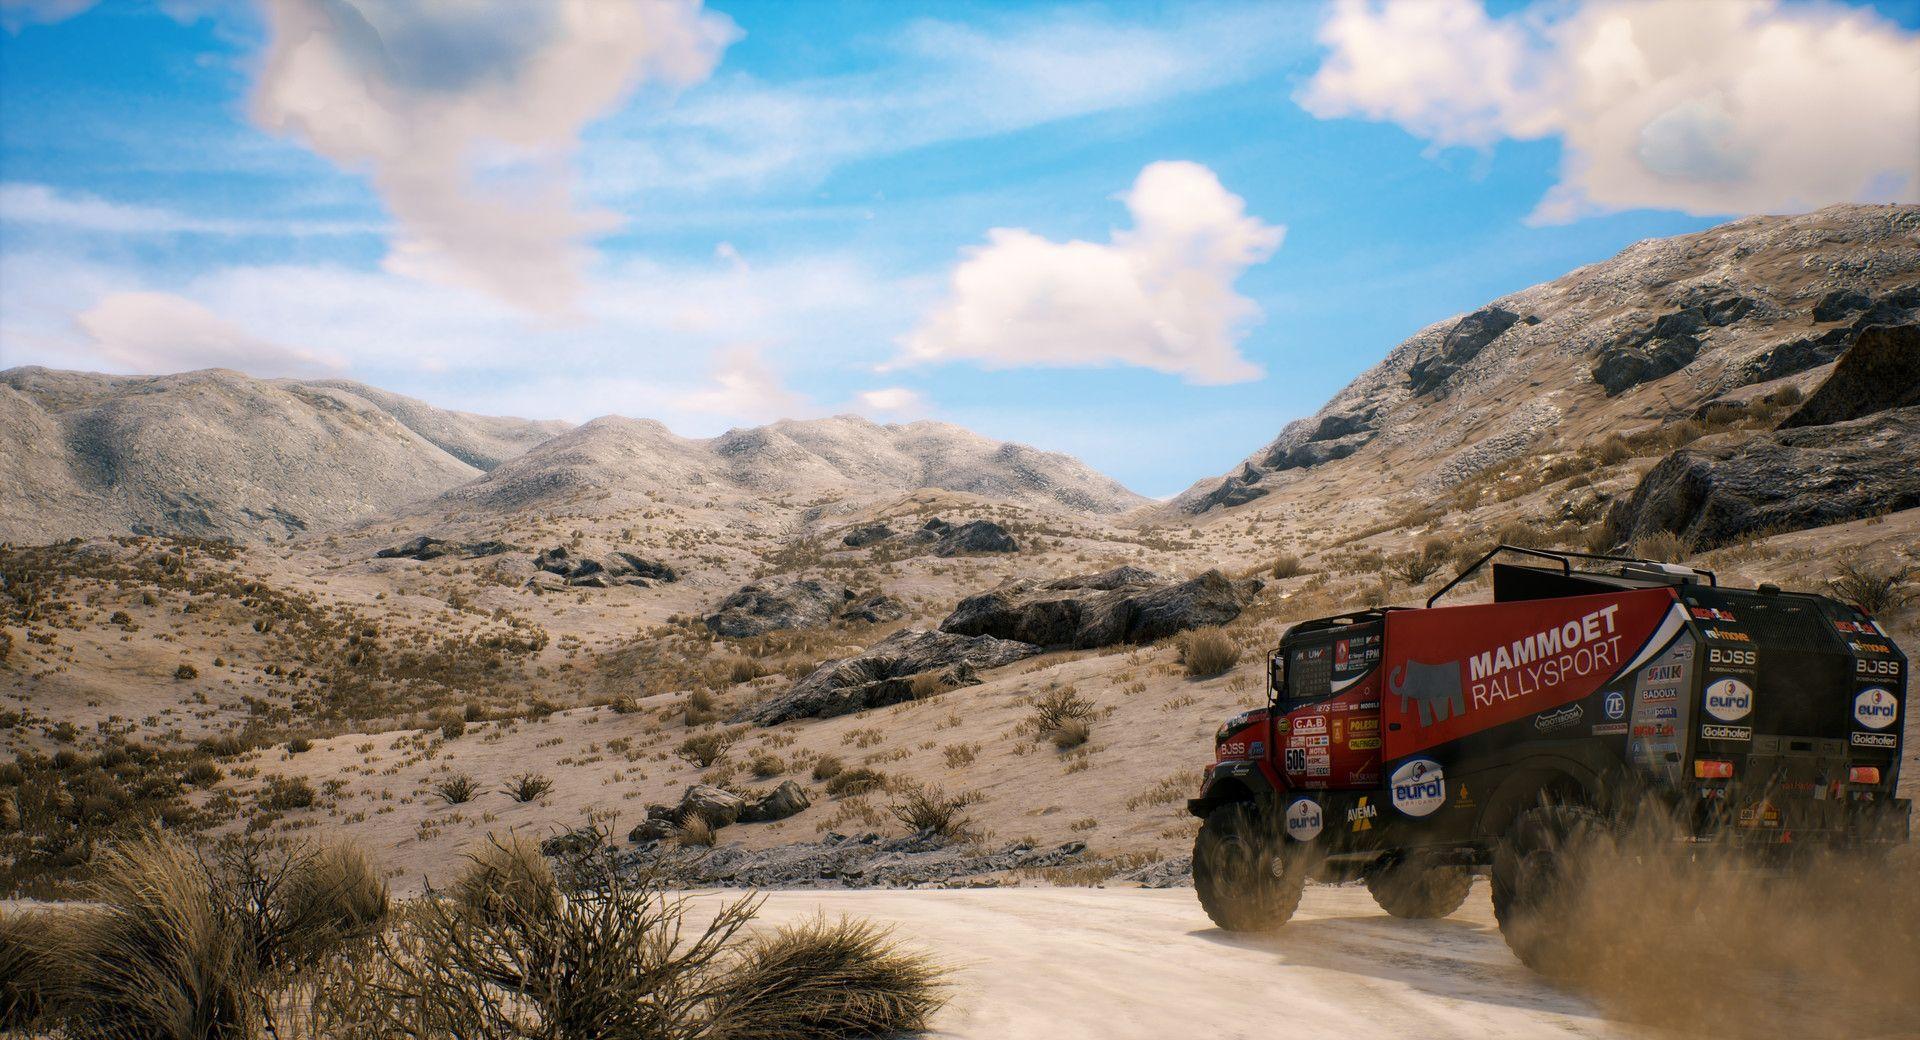 Dakar 18 (PS4) - 8